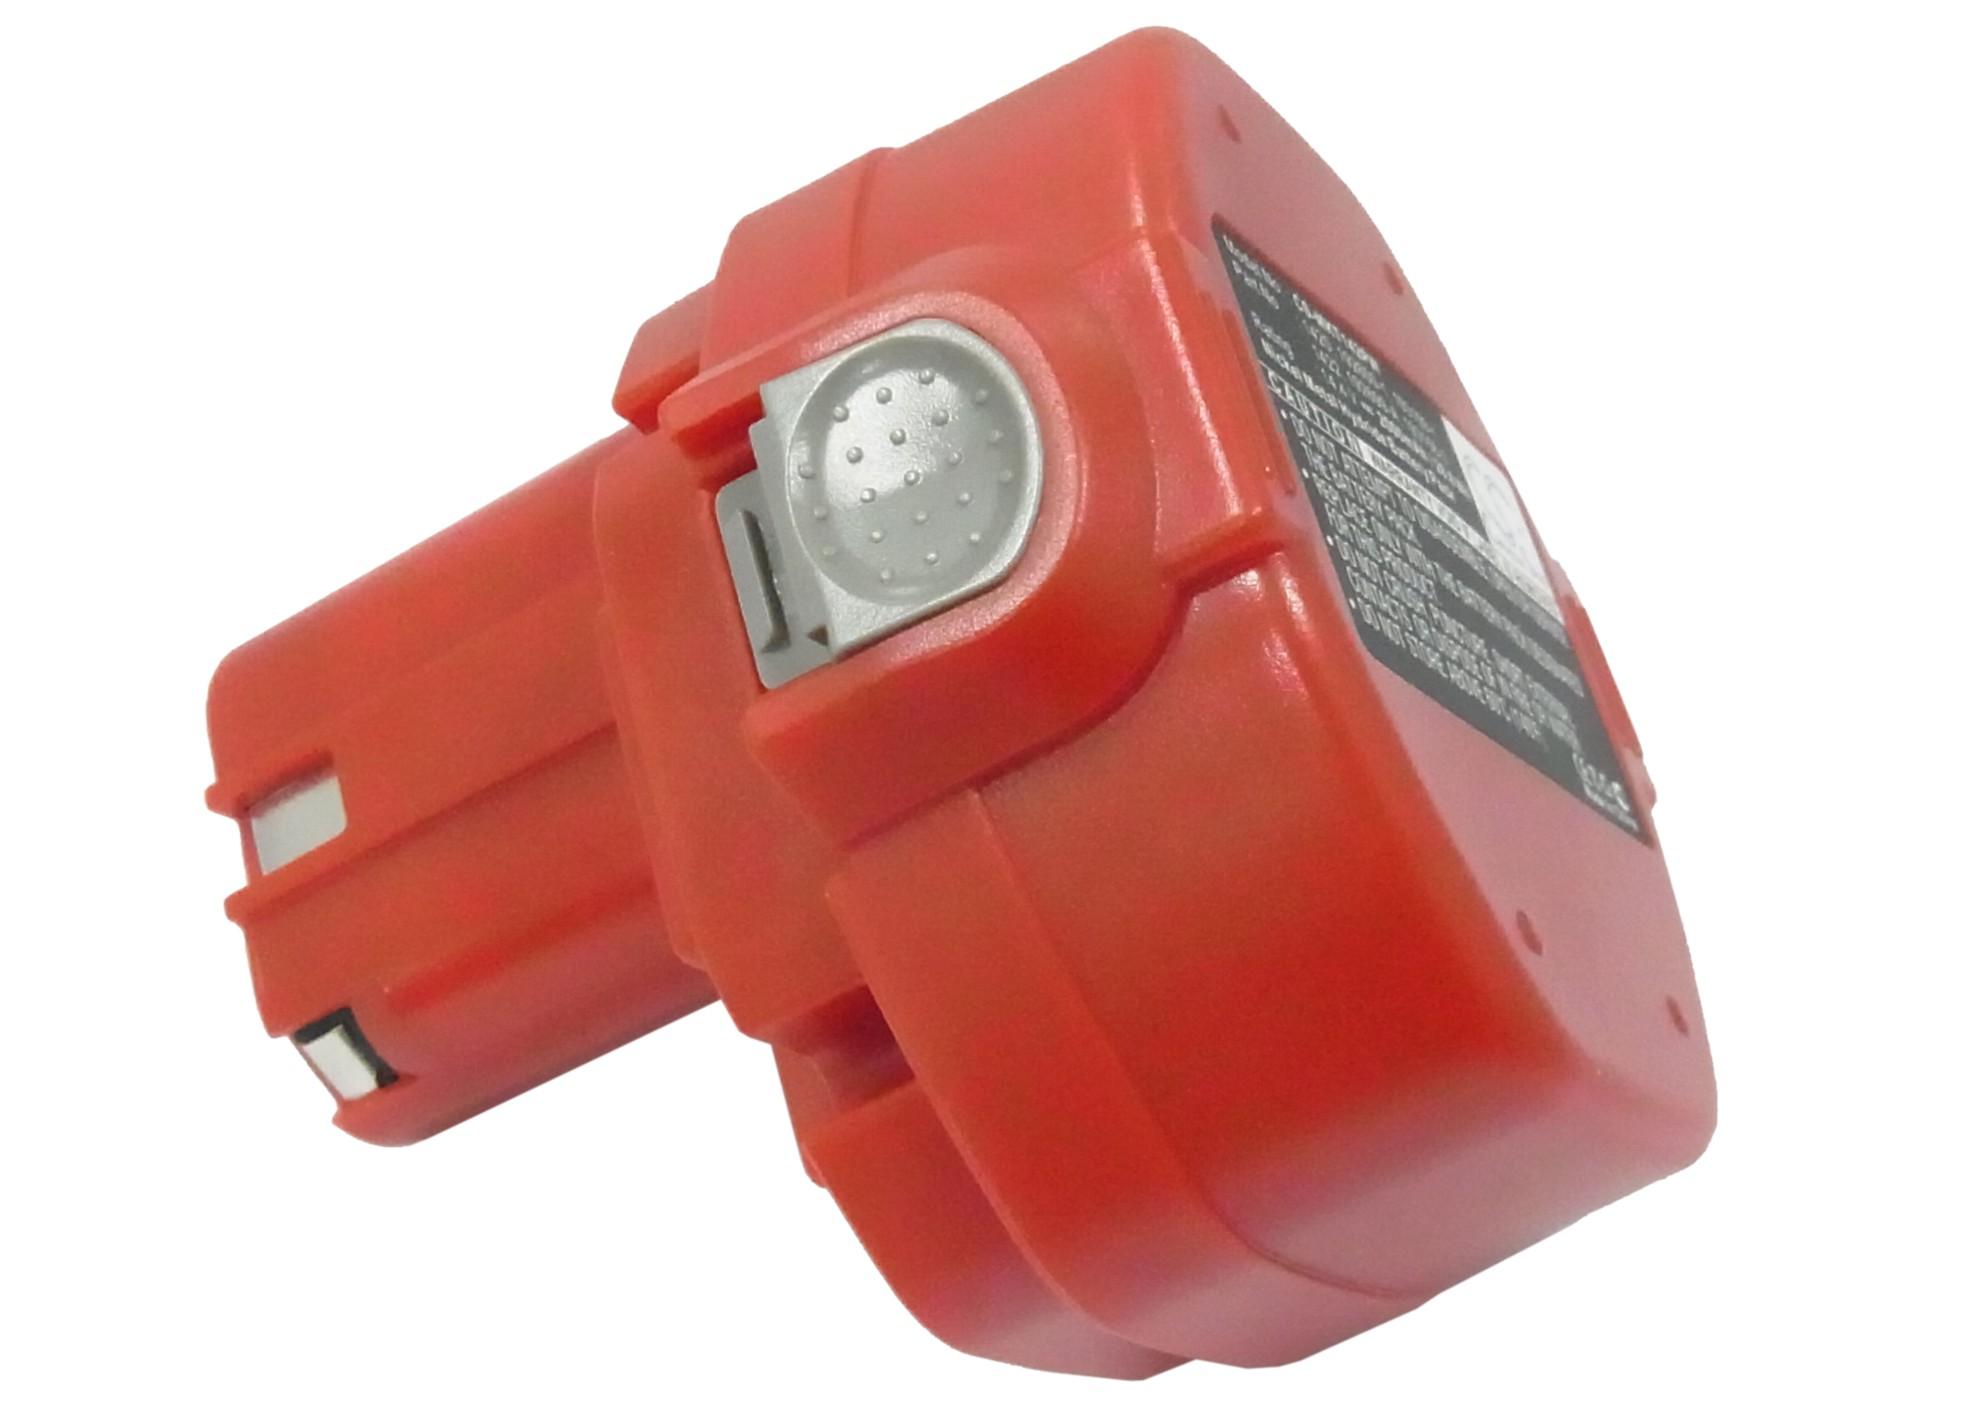 Cameron Sino baterie do nářadí pro MAKITA 6333D 14.4V Ni-MH 2000mAh červená - neoriginální